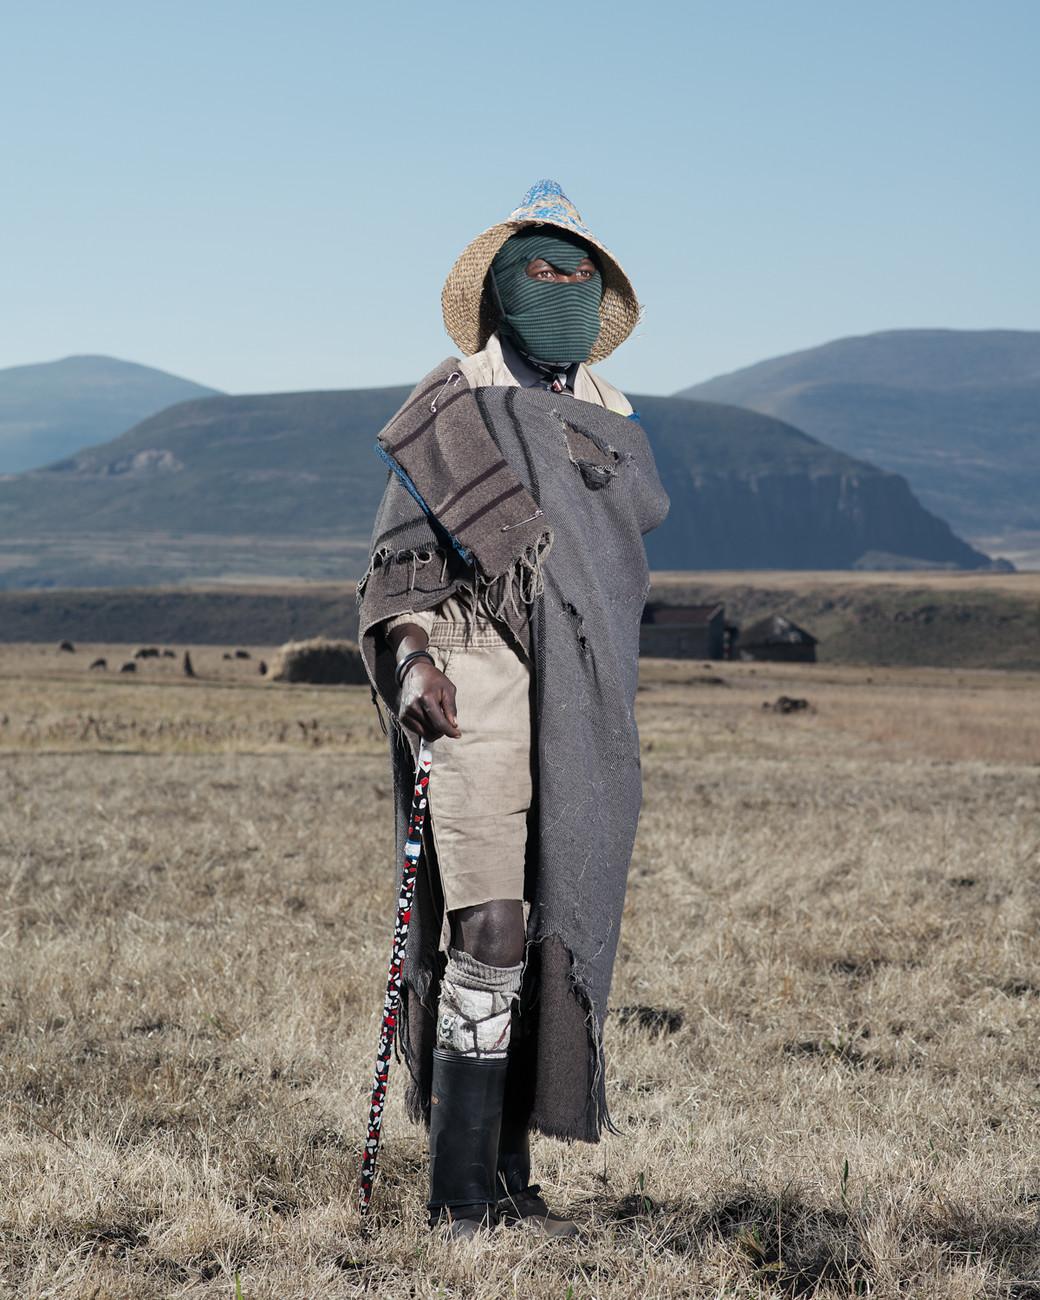 Lesotho herdsmen green balaclava standing